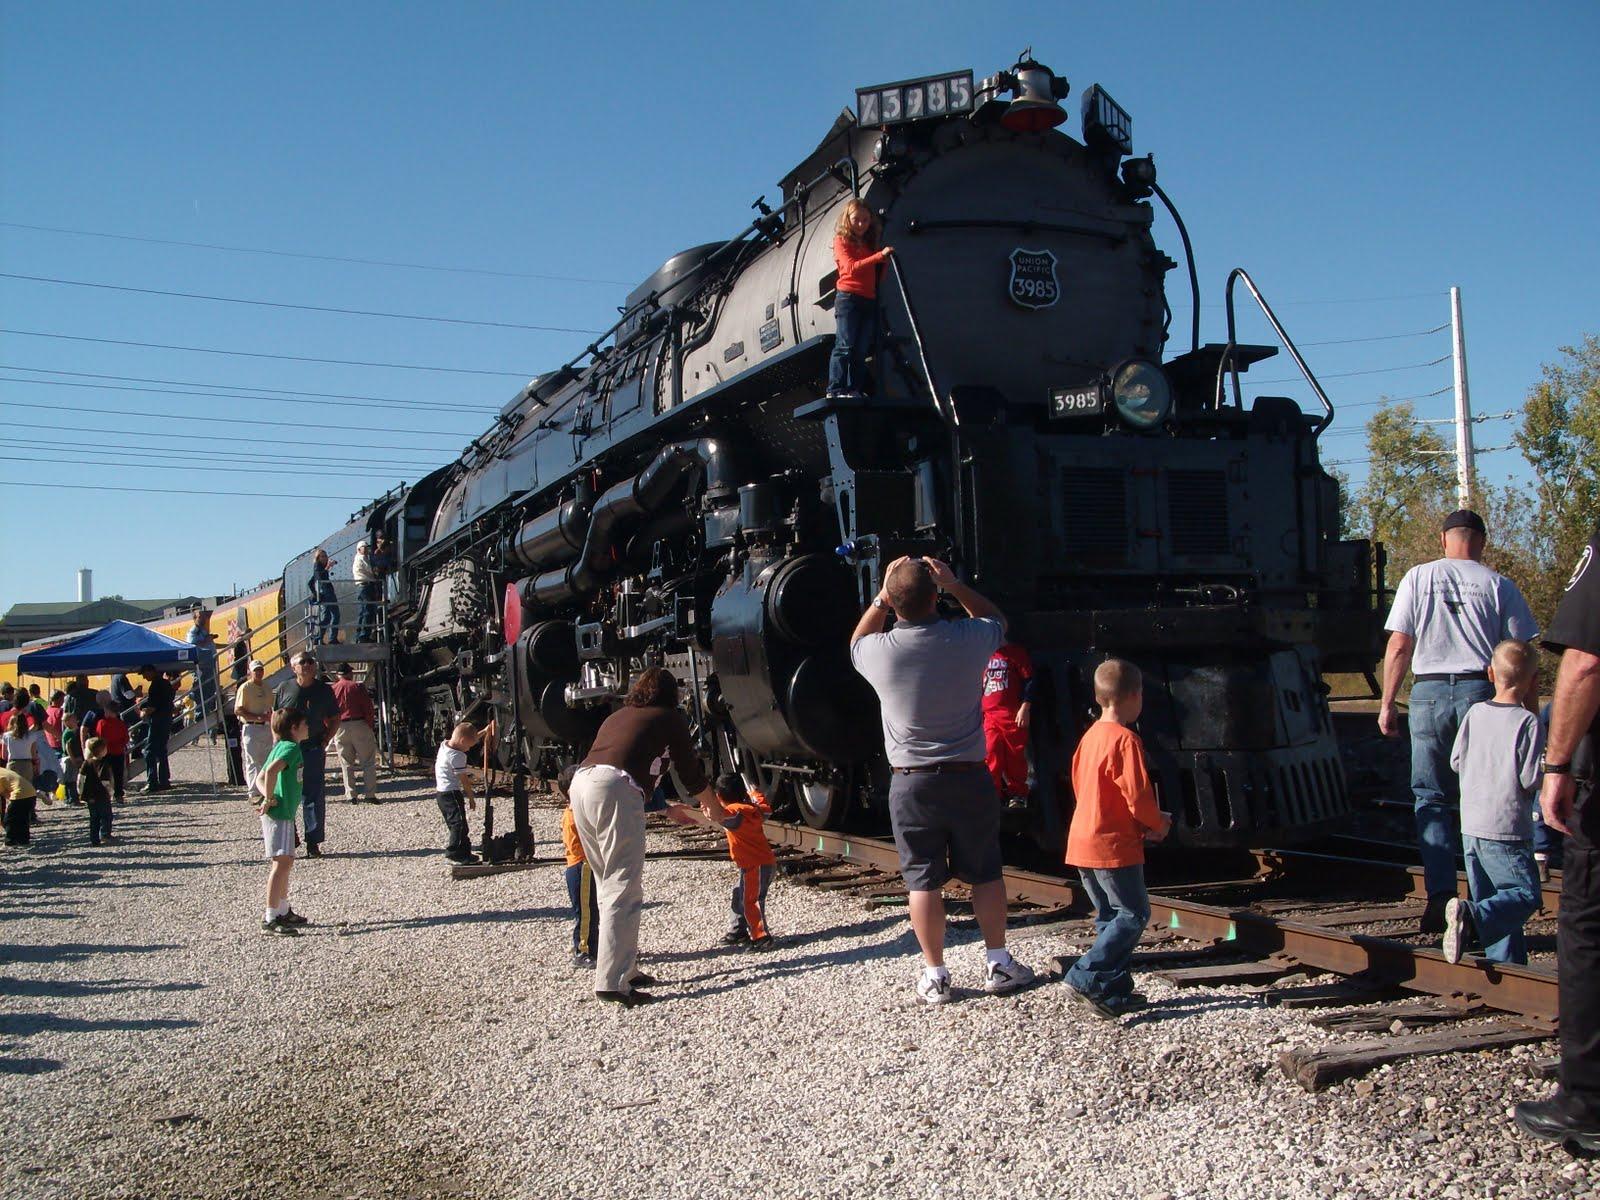 Osage Bluff Quilter: The Worlds Largest Steam Locomotive